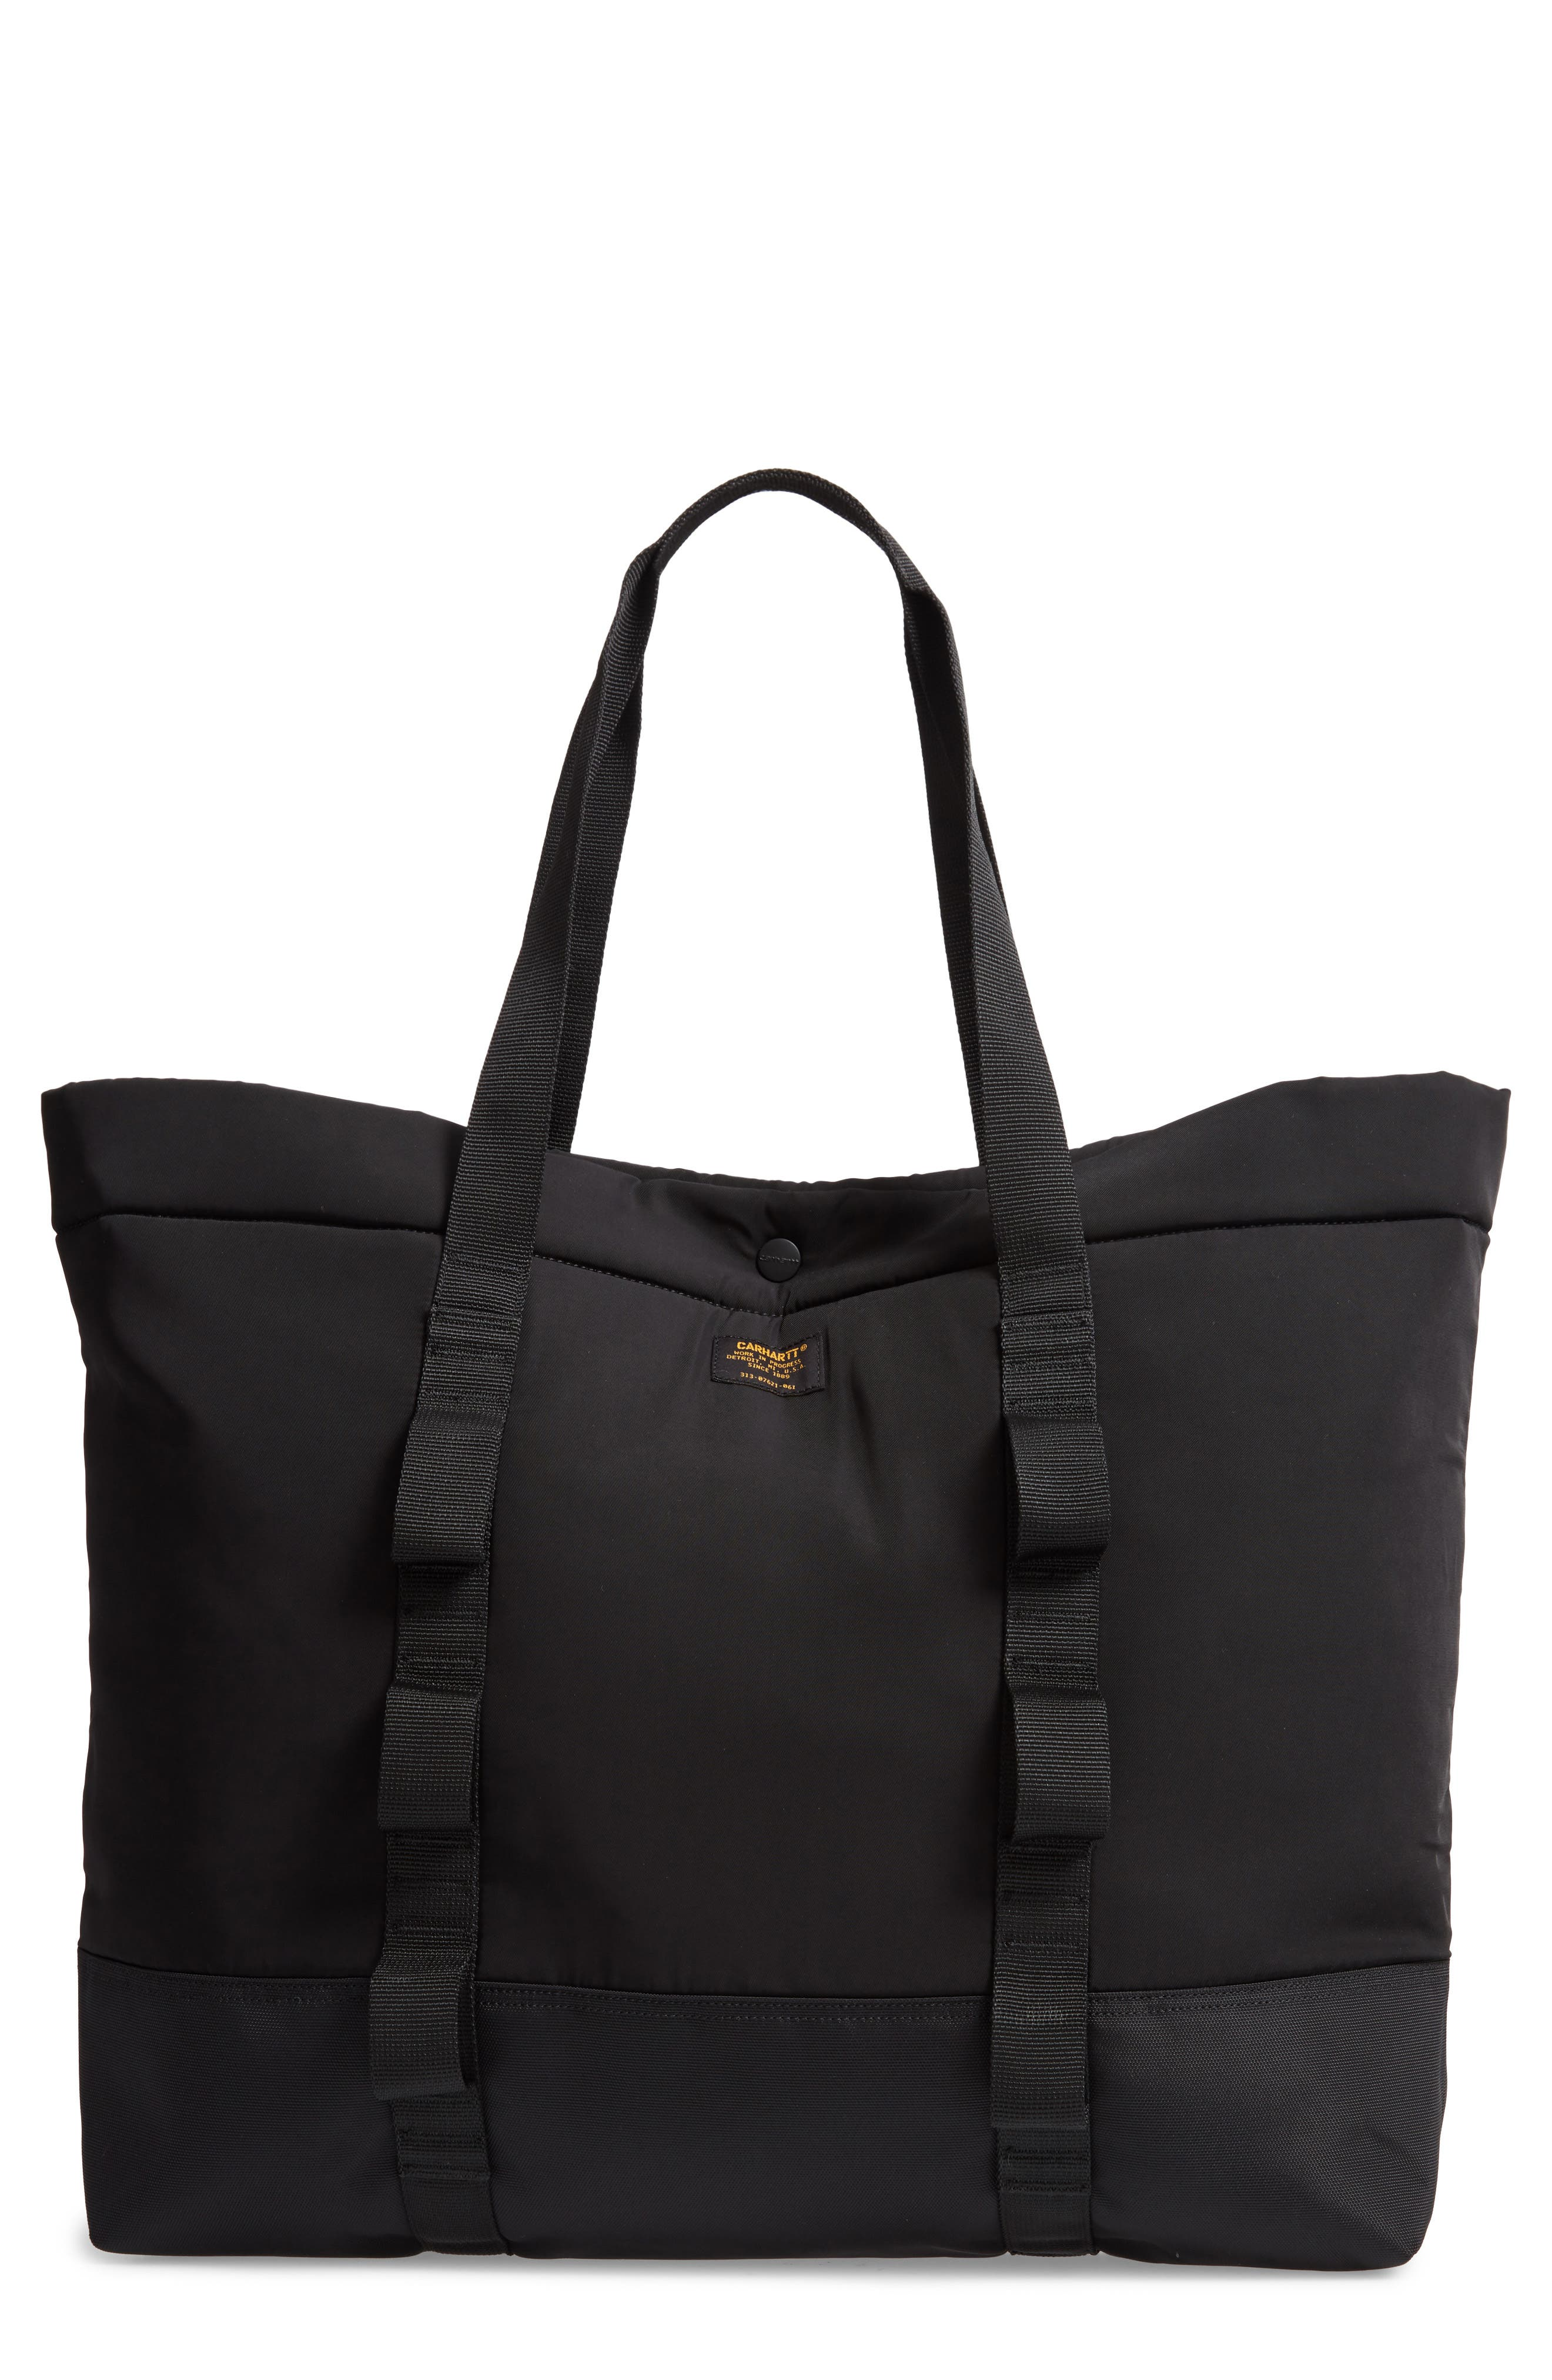 Military Shopper Tote Bag,                         Main,                         color, 001